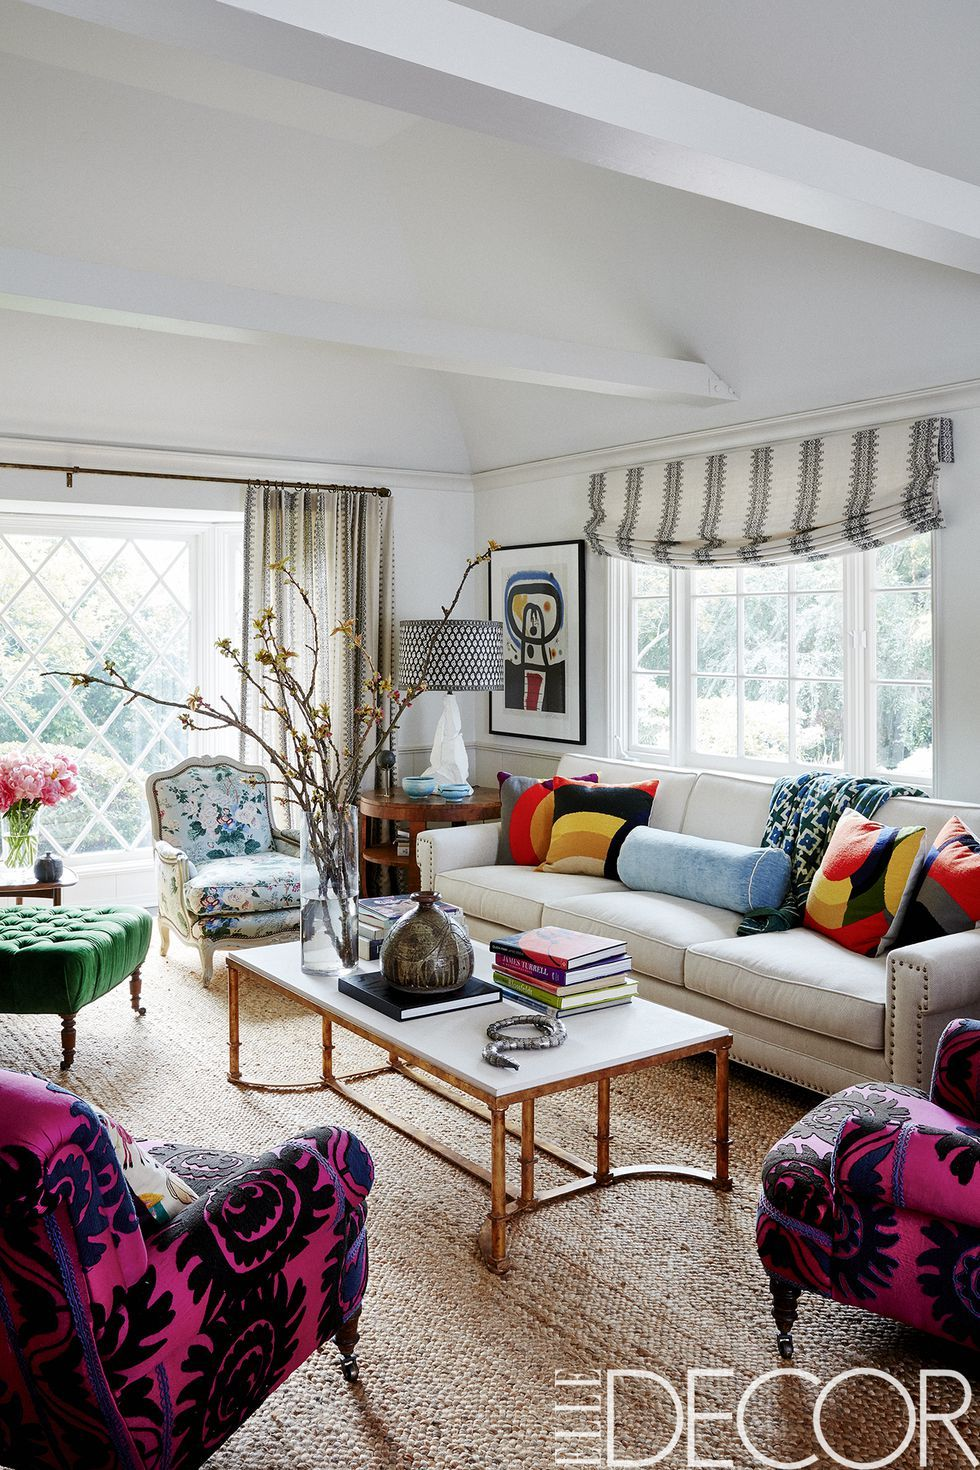 50 inspiring curtain ideas window drapes for living rooms rh elledecor com curtains styles for living room curtain ideas for living room modern